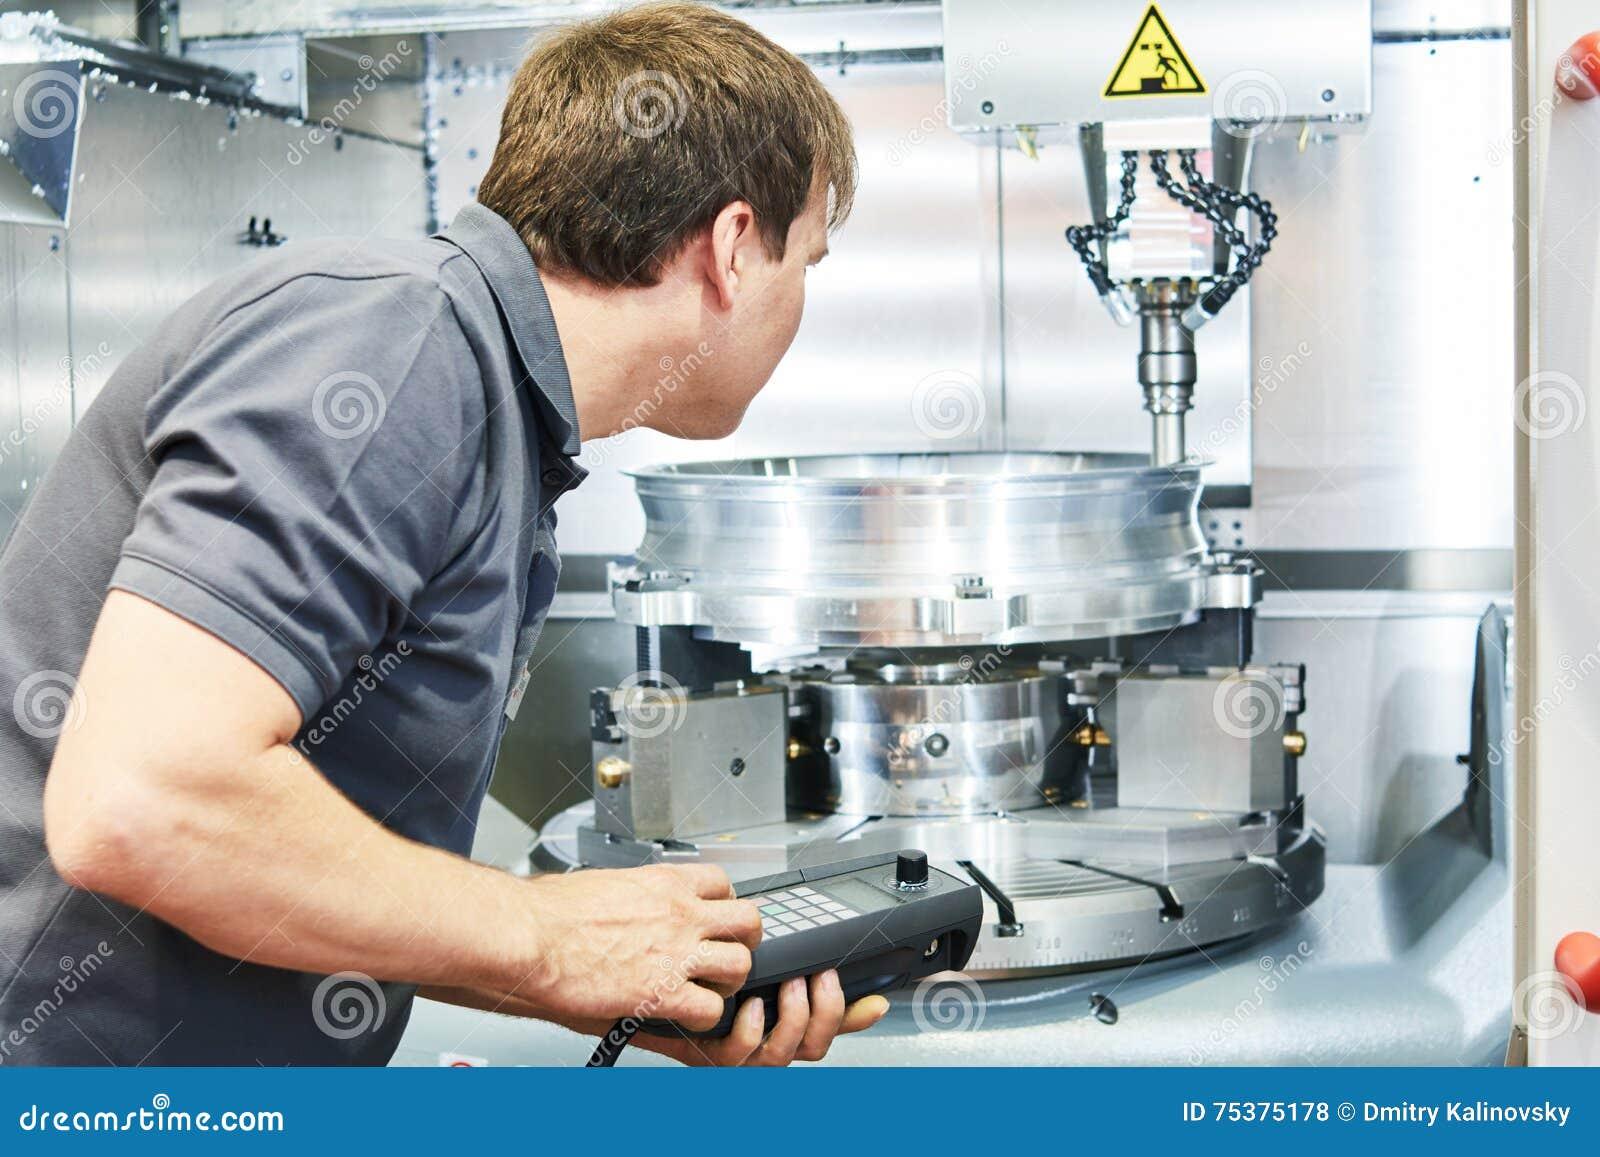 Metaal die de industrie machinaal bewerken Arbeider die cnc malenmachine in werking stellen